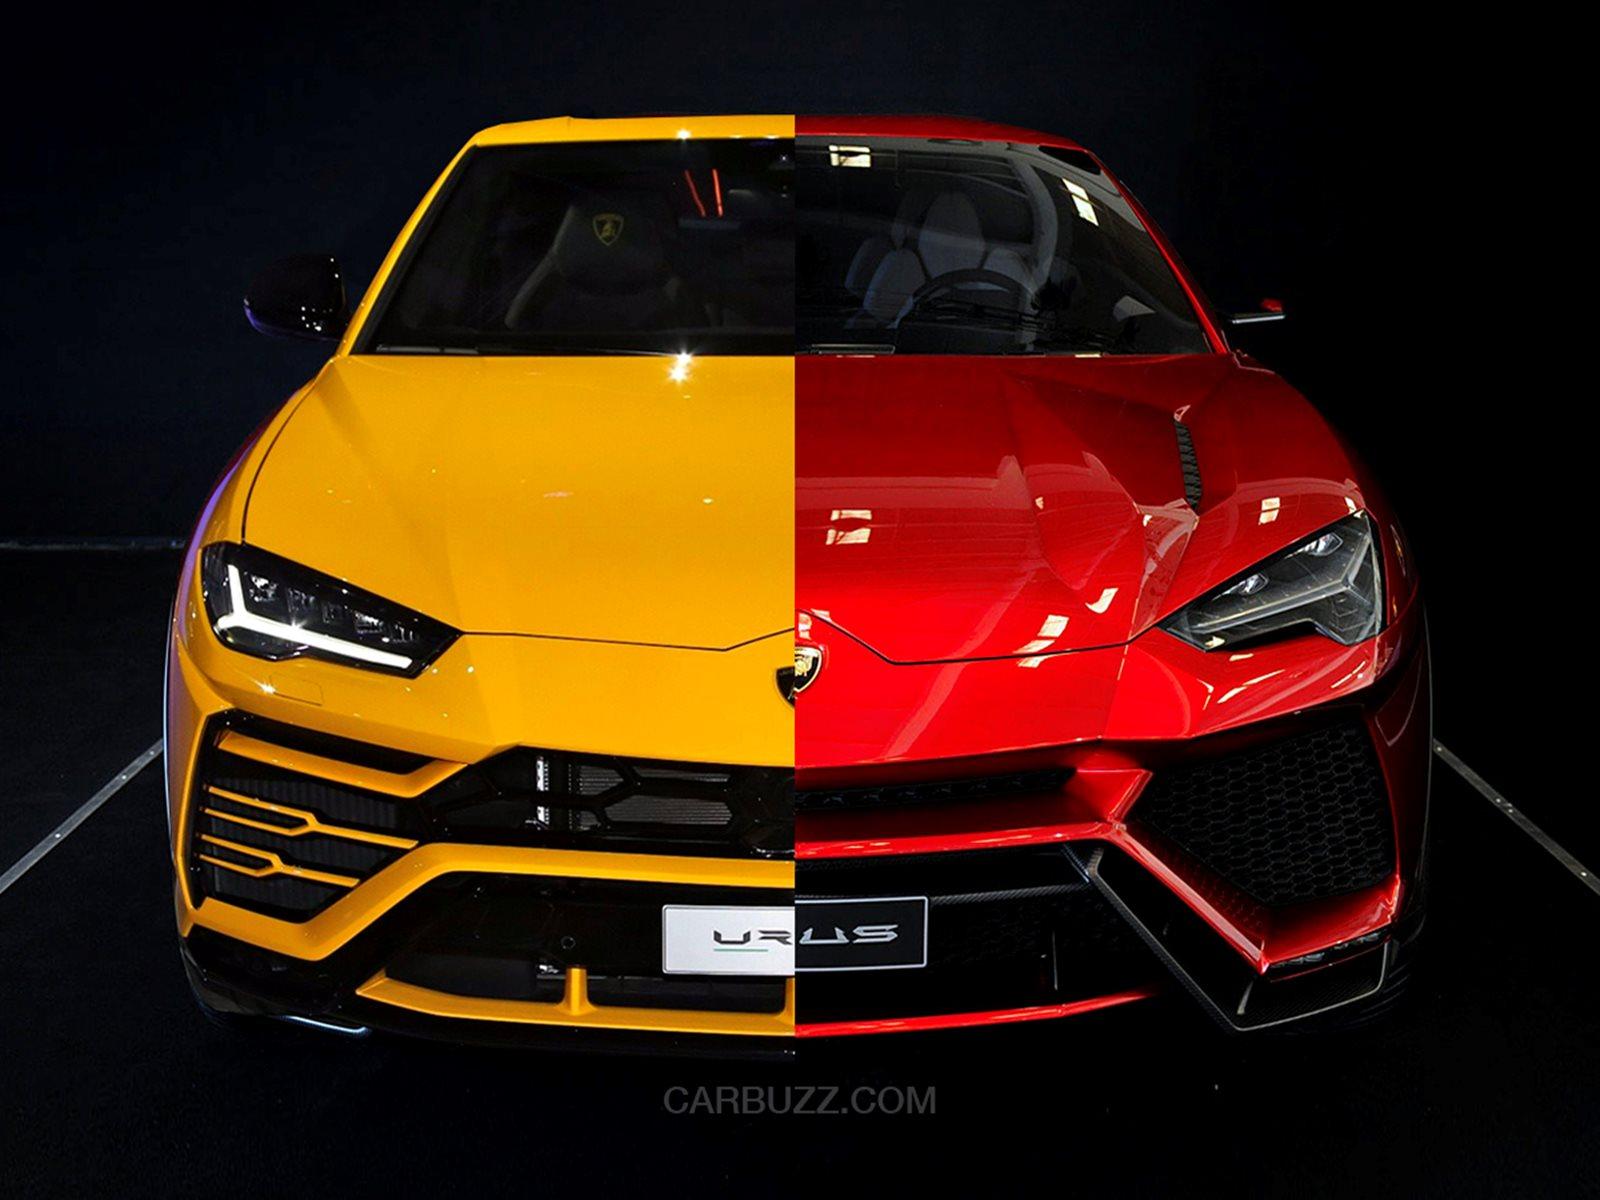 lamborghini urus design changes 2012 concept vs 2017 final versionlamborghini urus design changes 2012 concept vs 2017 final version carbuzz